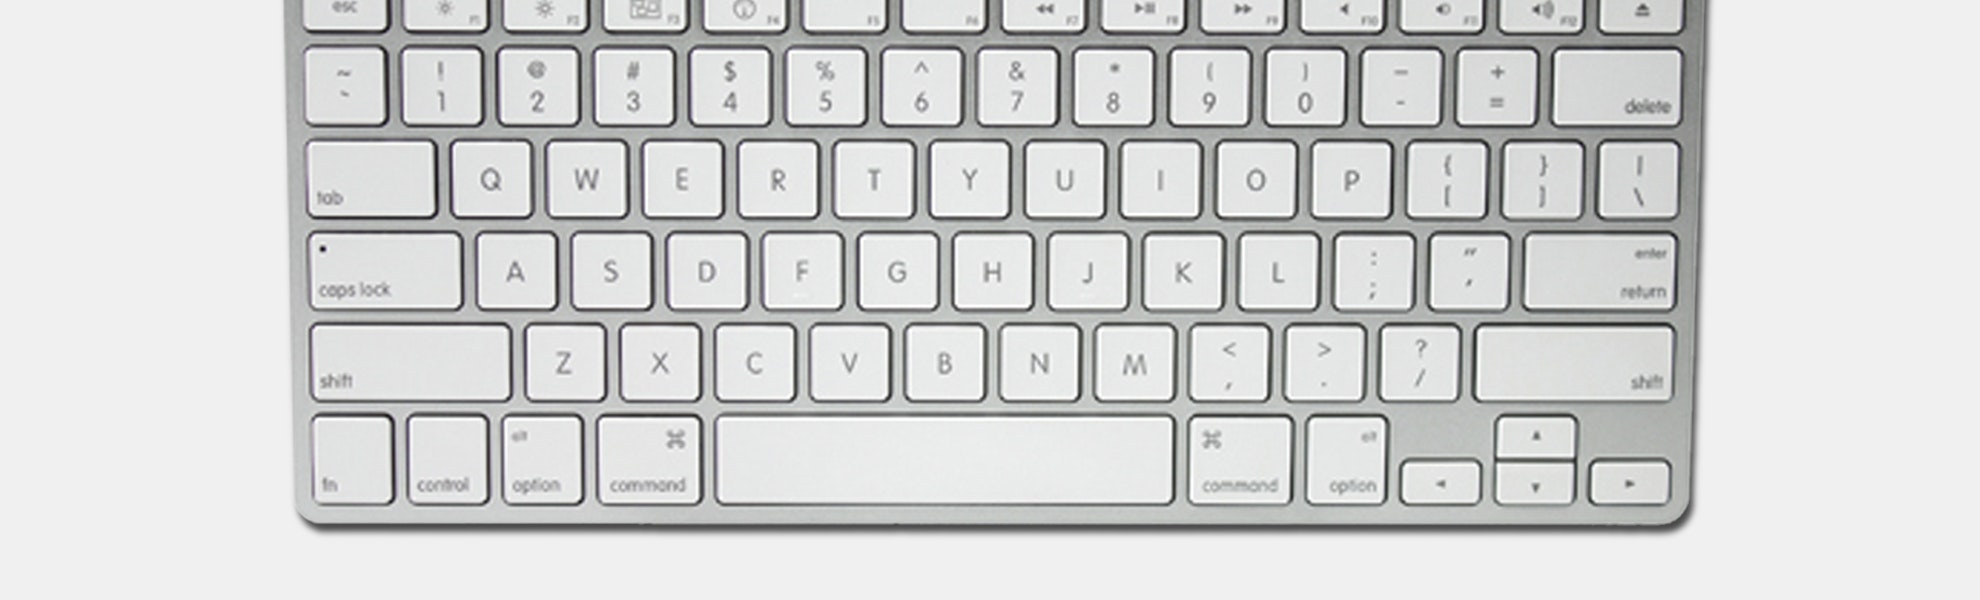 Apple Wireless Keyboard (MC184LL/A)